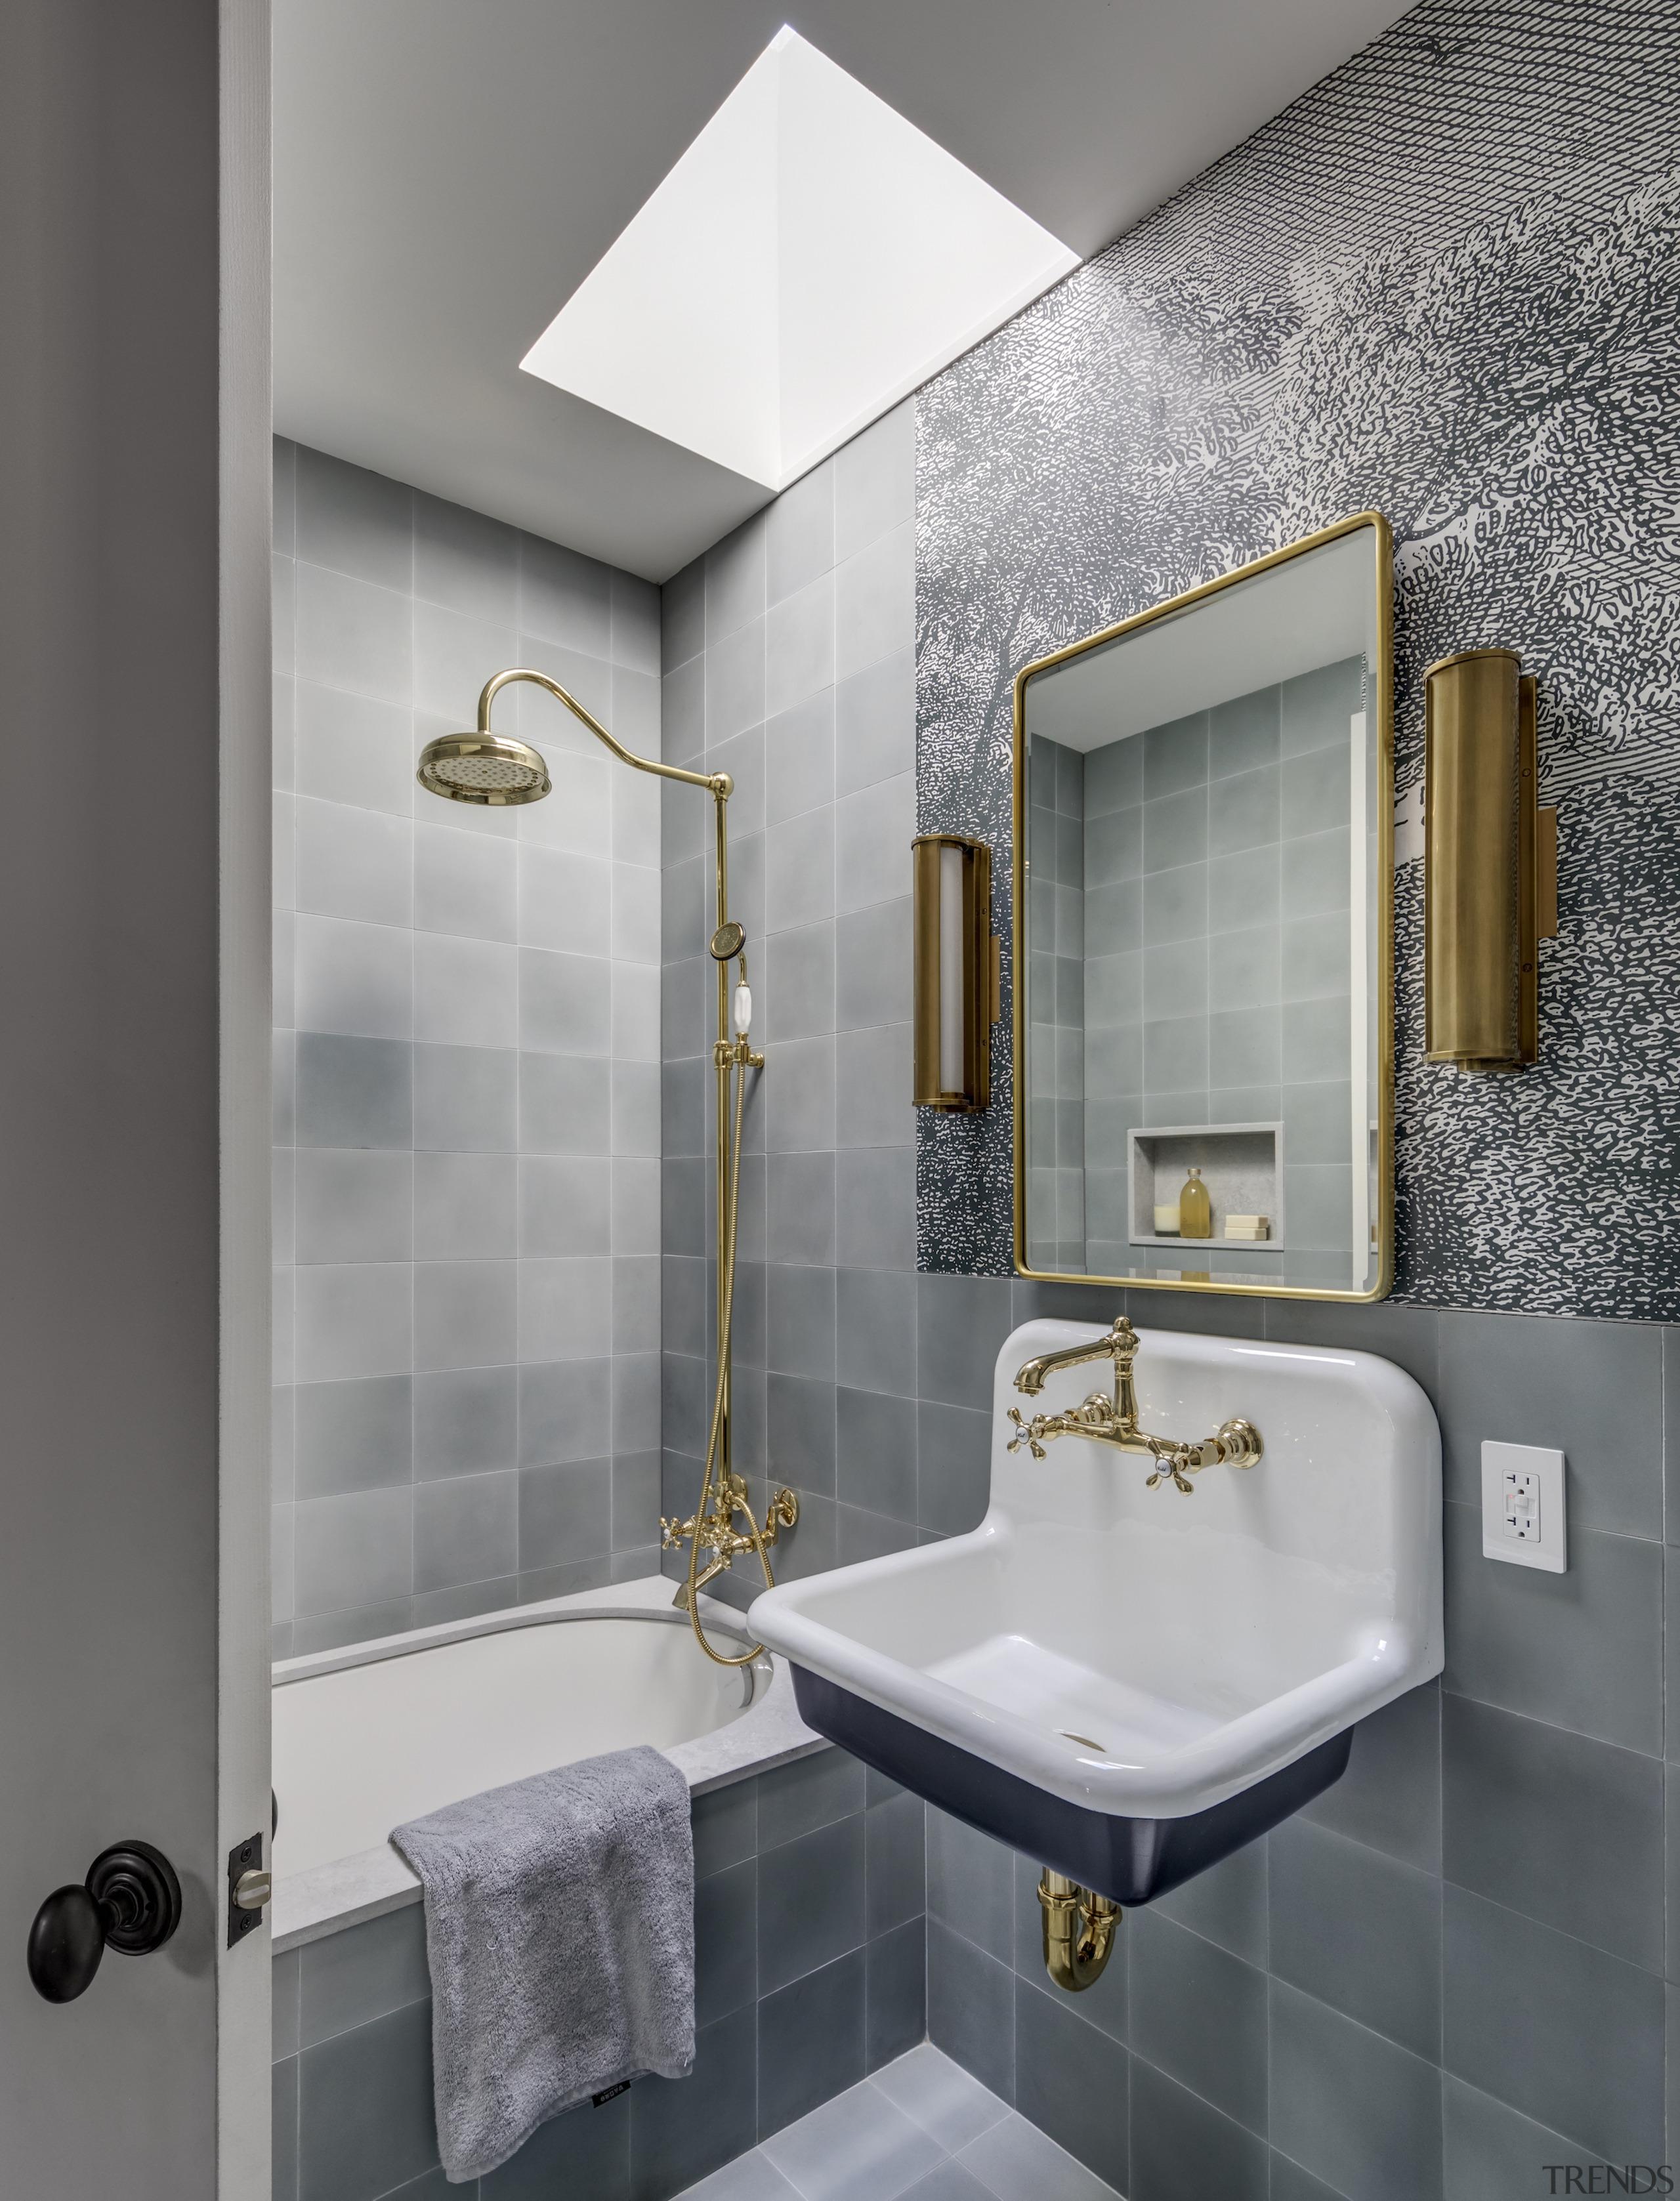 The third floor bathroom features an exotic wallpaper